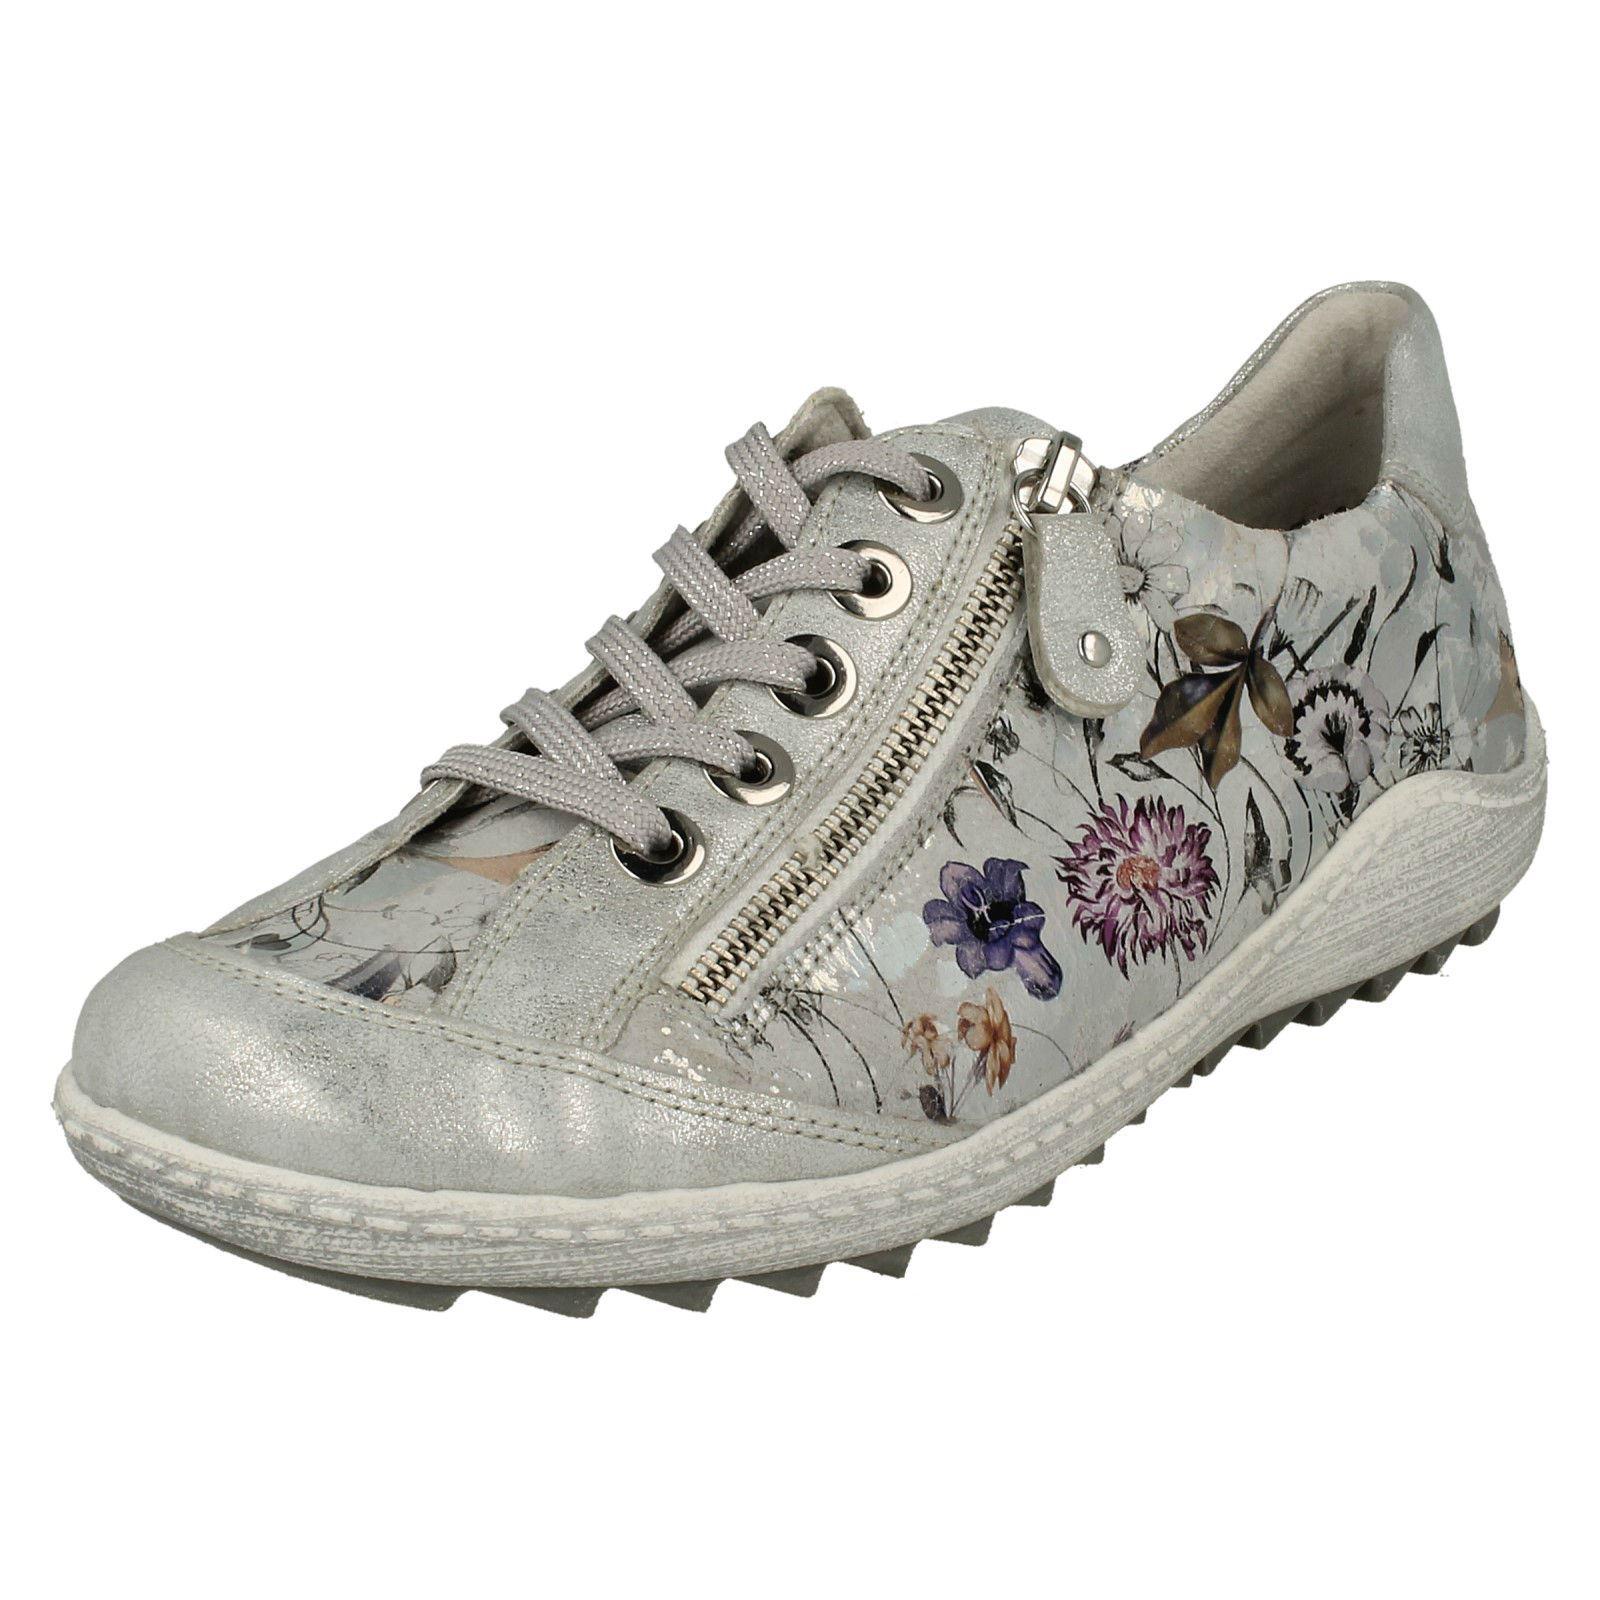 Remonte Women/'s R1402 Low-Top Sneakers